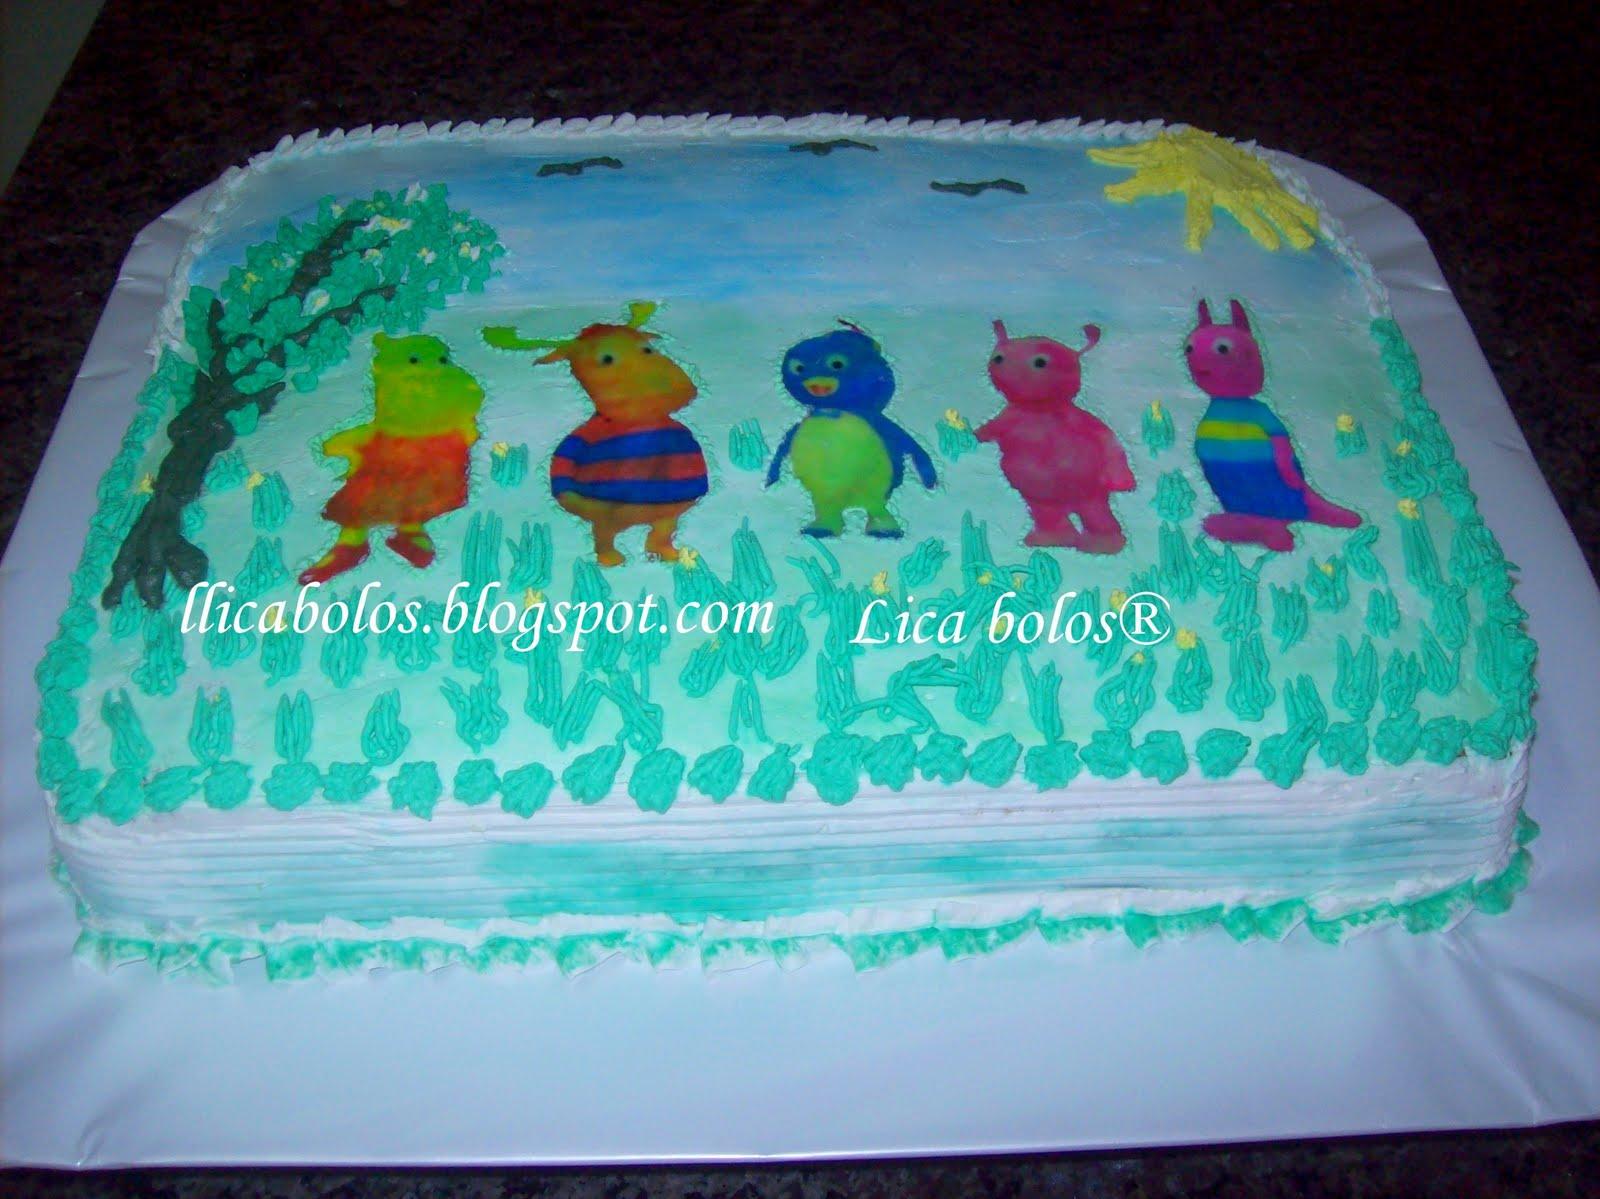 lica bolos ensinando e aprendendo papel arroz e chantilly